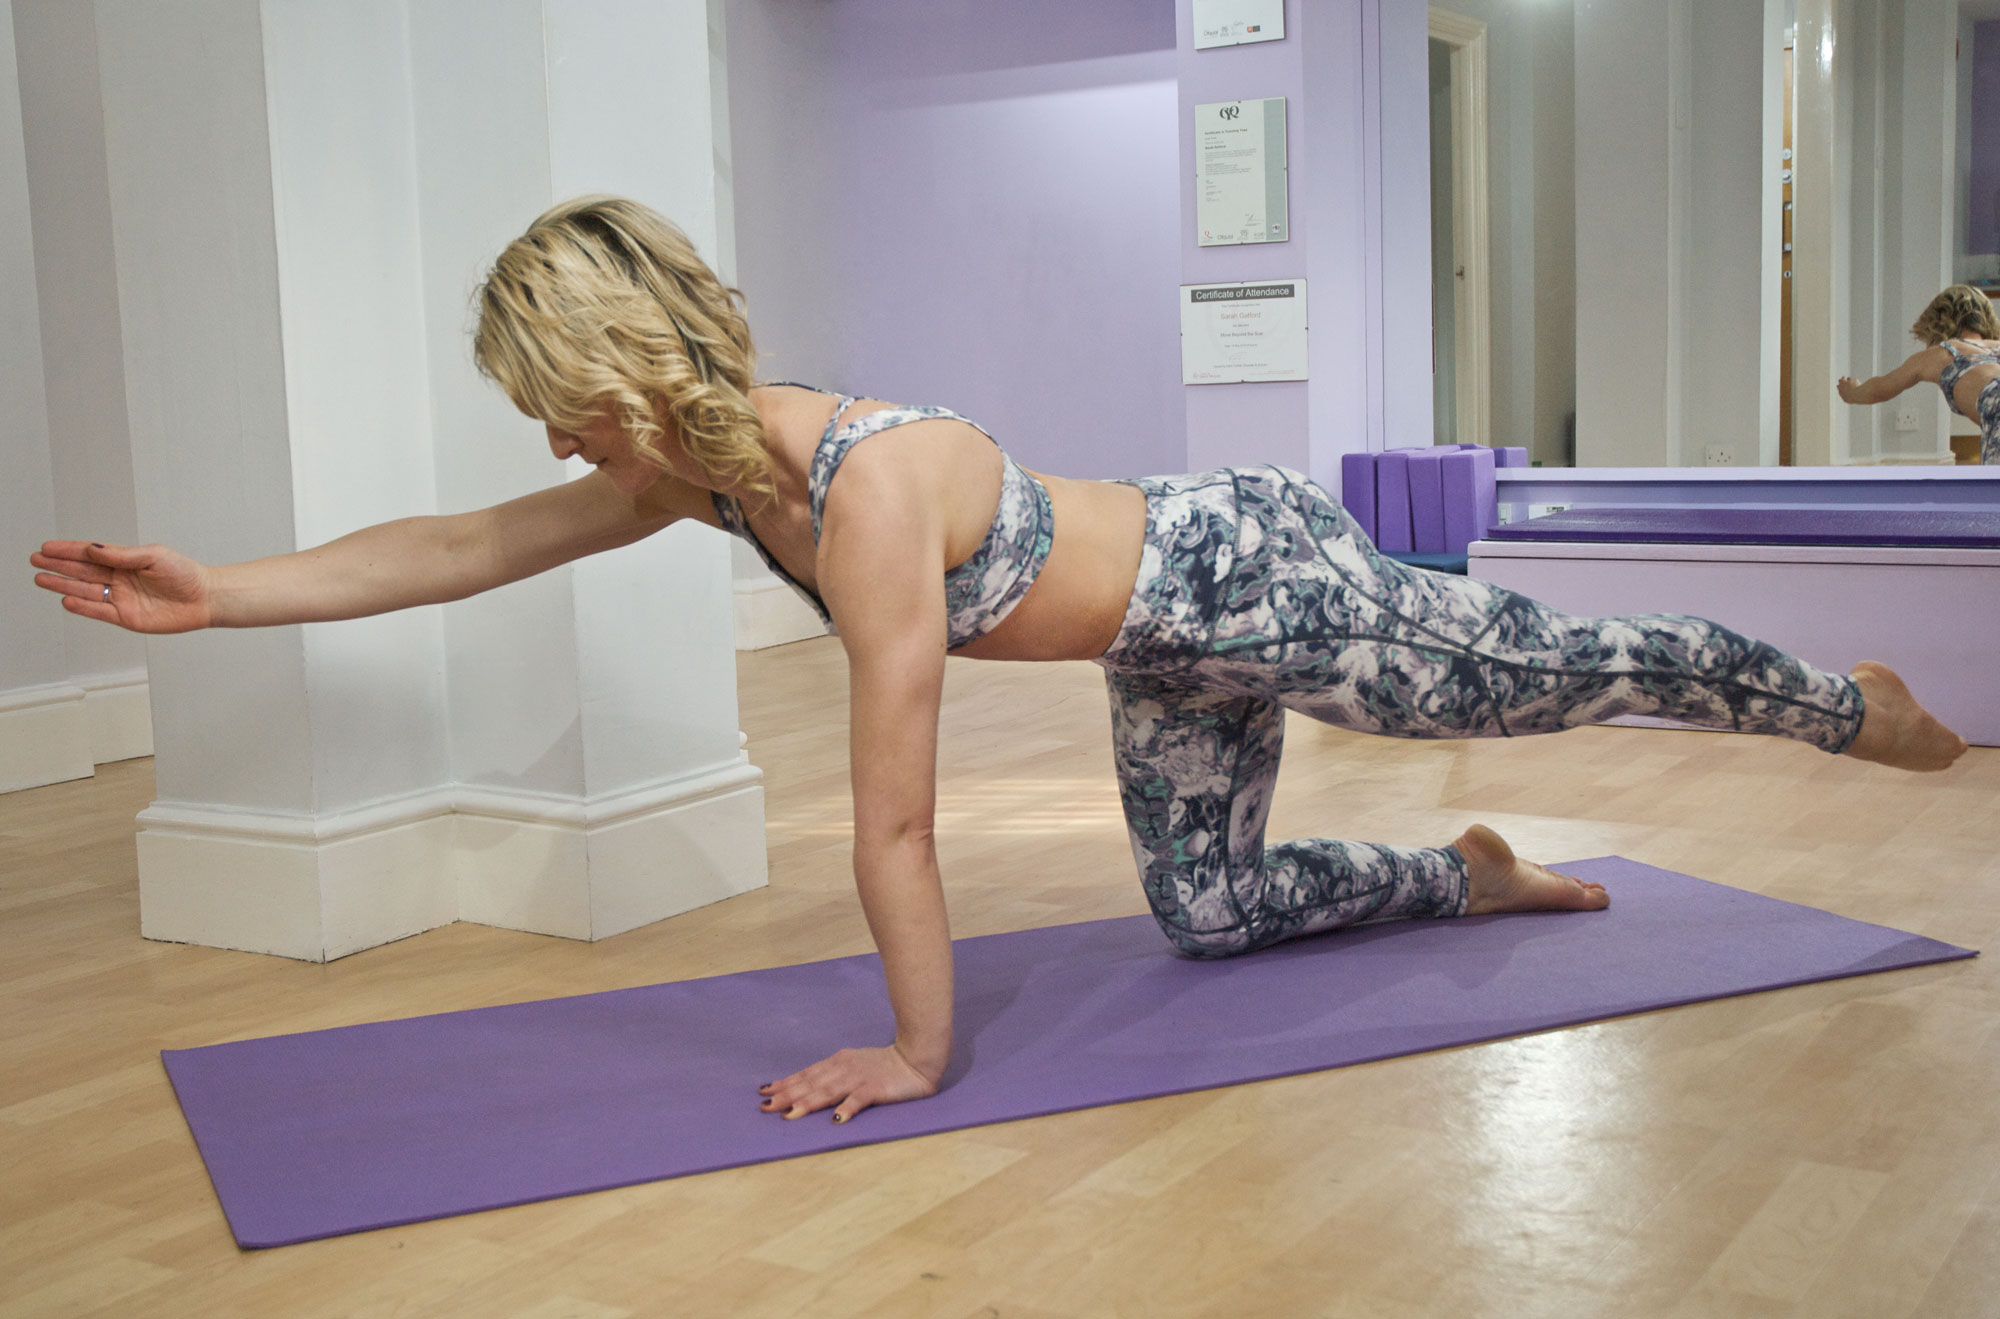 Yoga-pose-11-900x1024.jpg